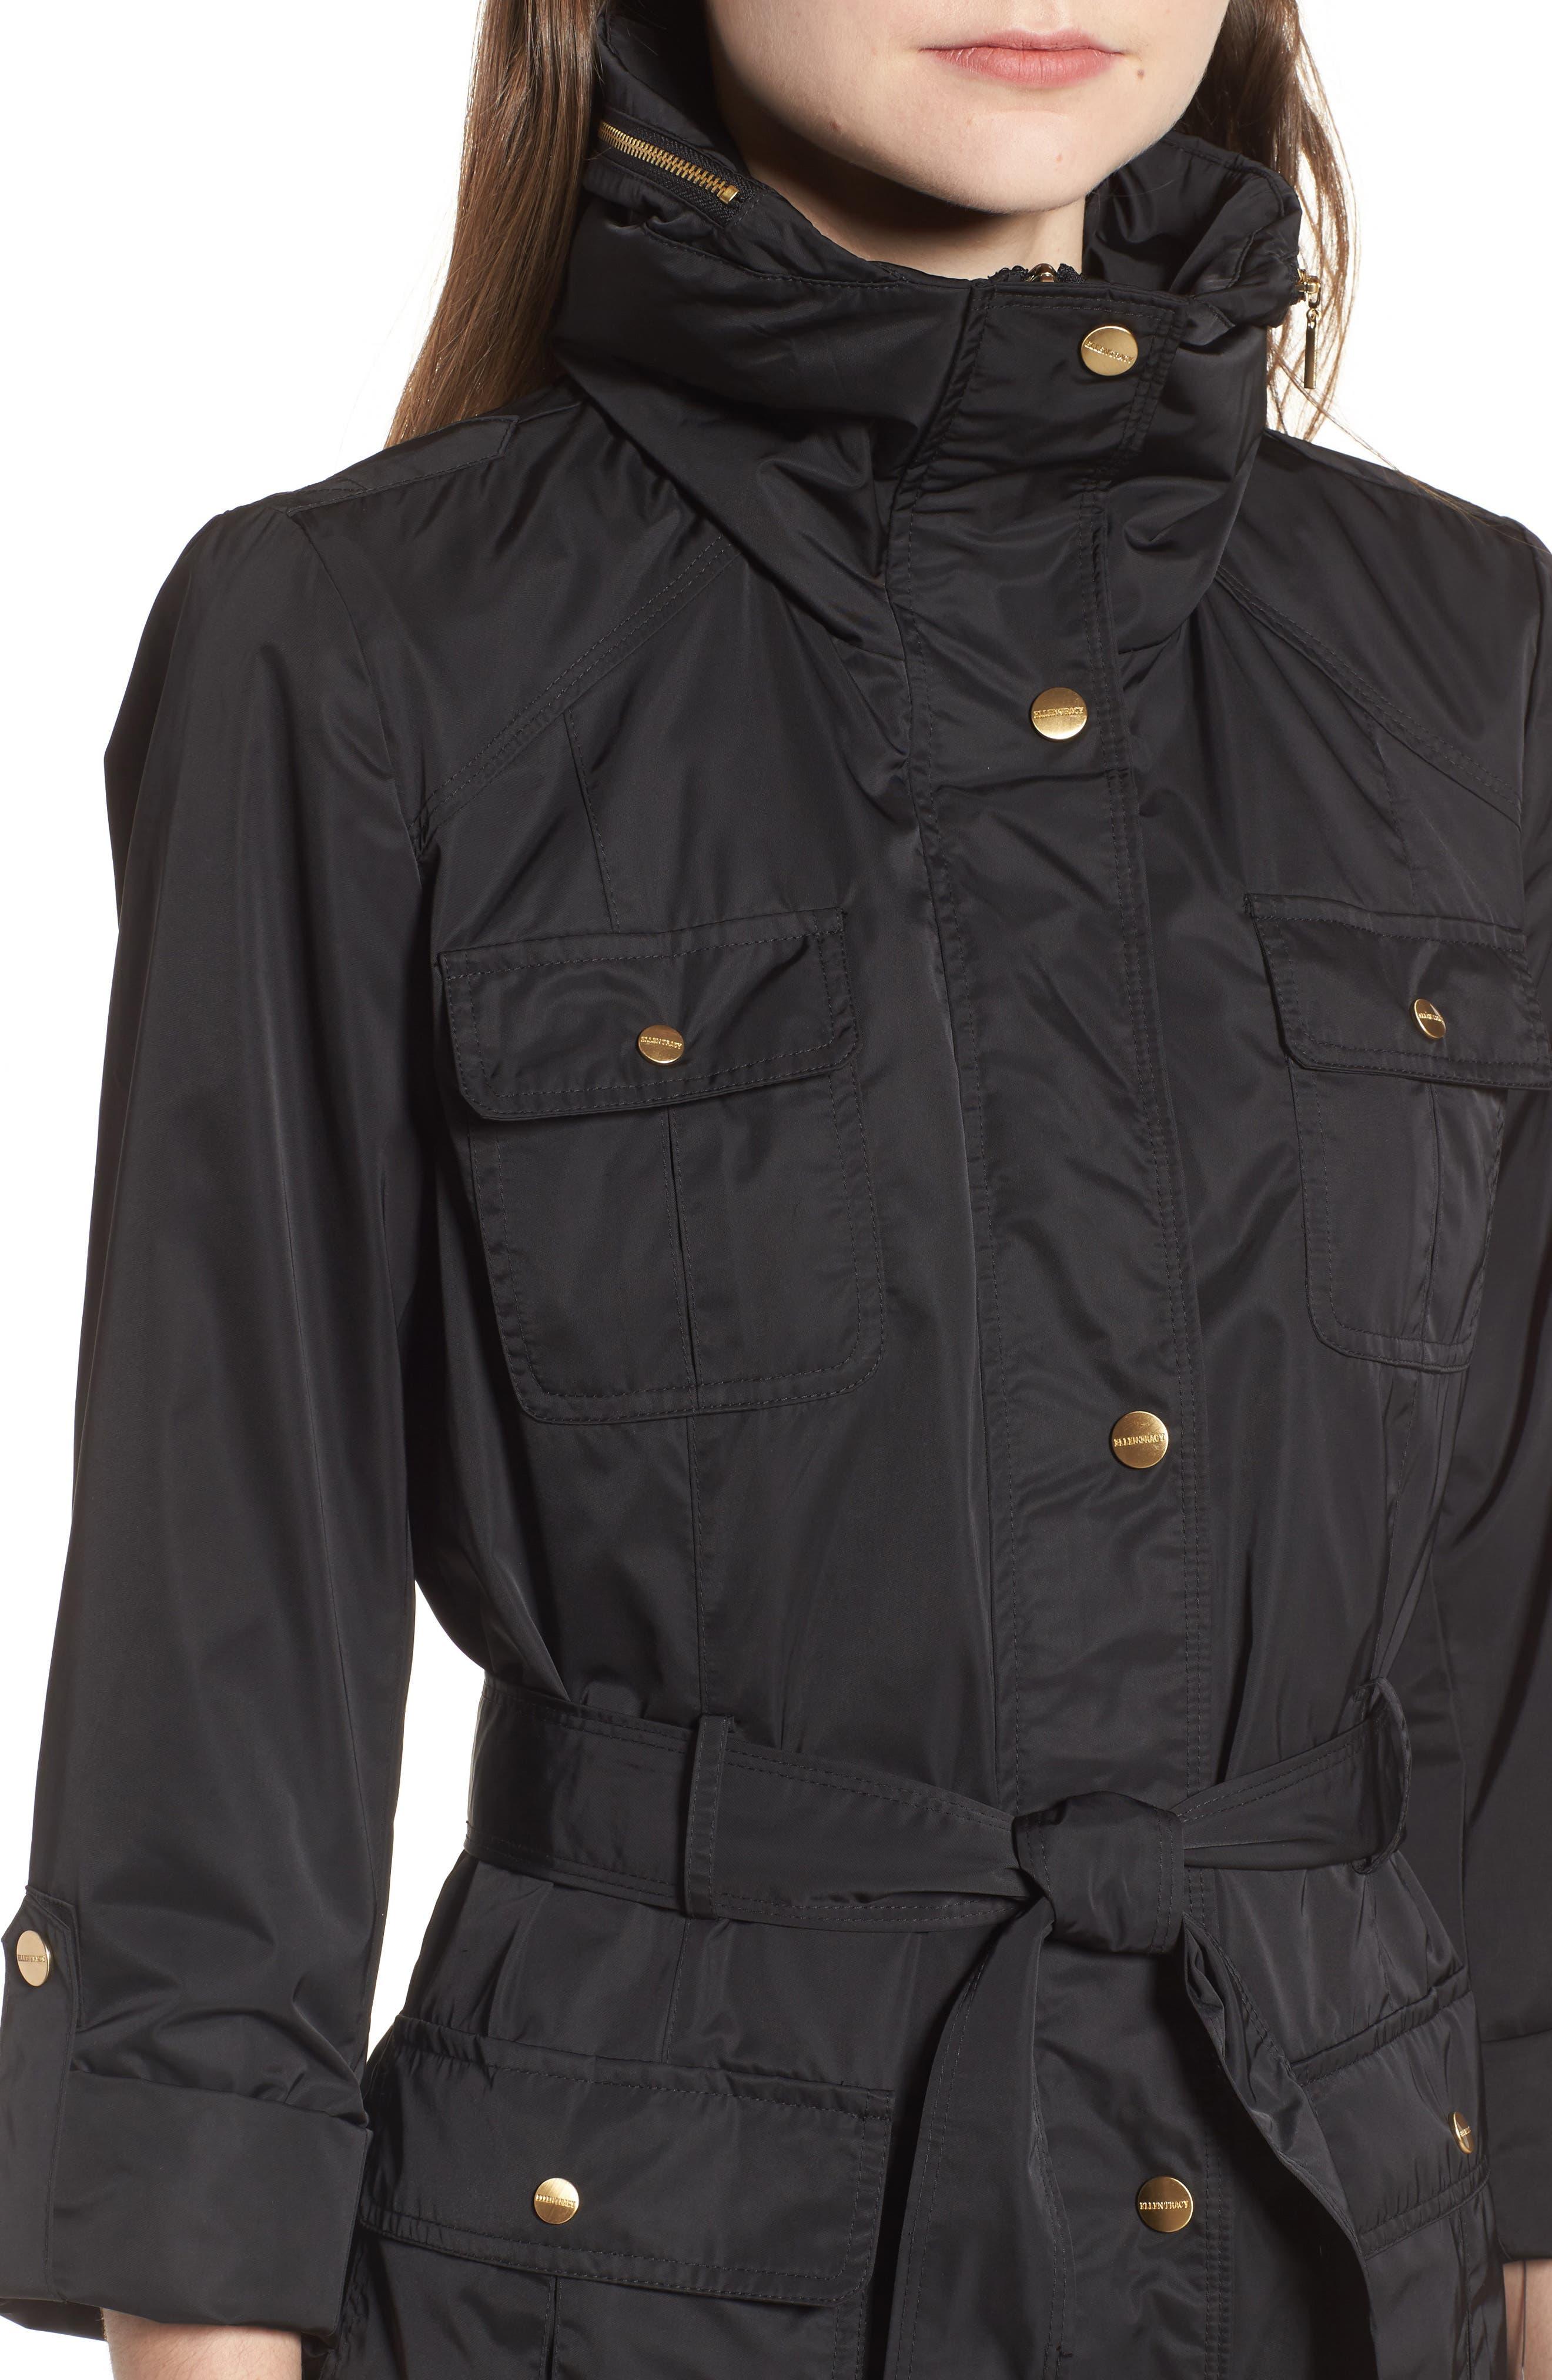 Techno Short Trench Coat,                             Alternate thumbnail 5, color,                             001